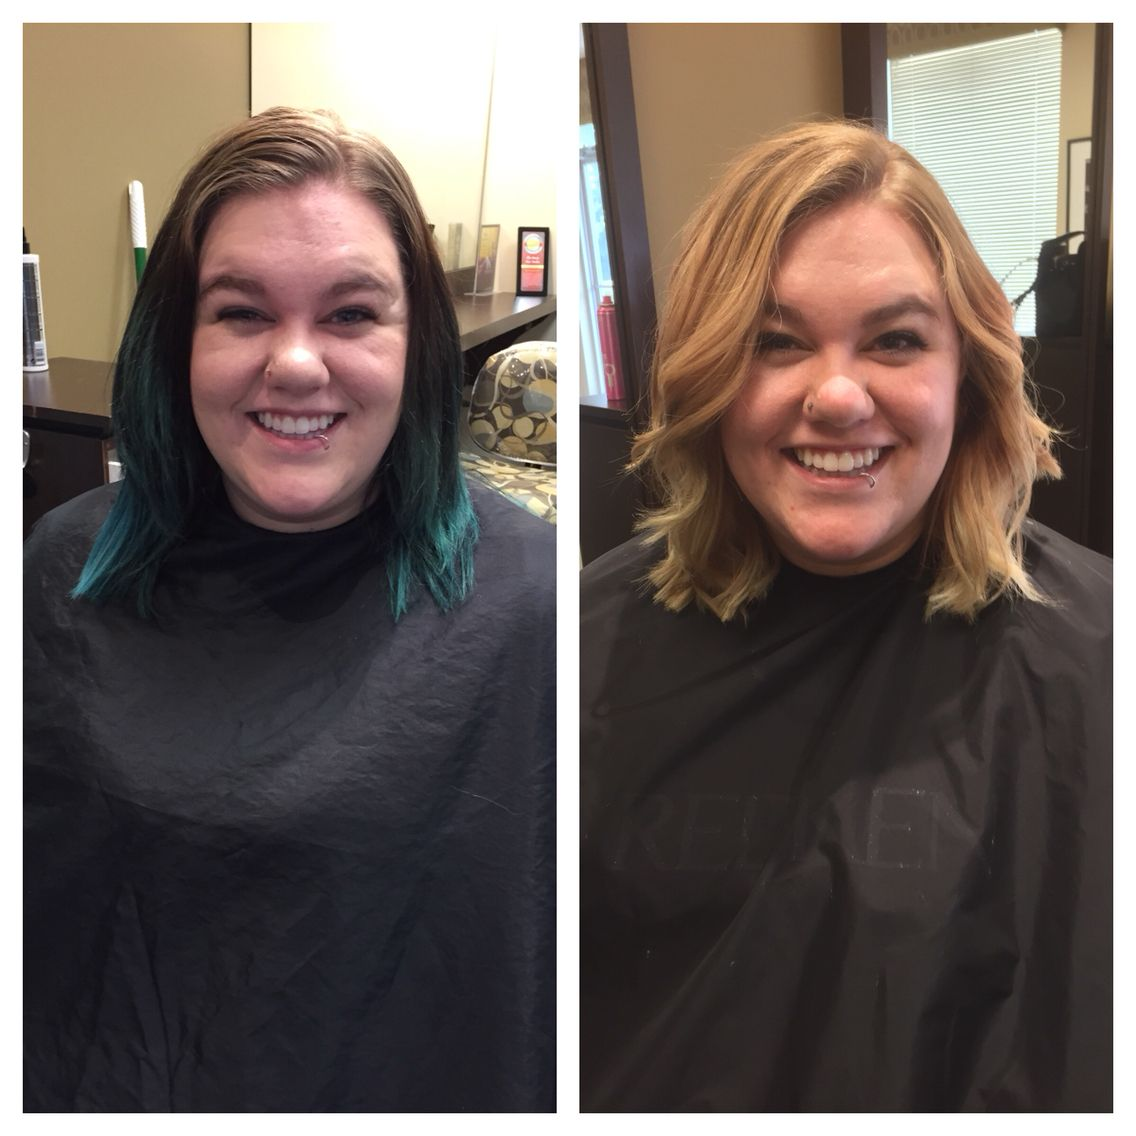 HUGE transformation, going back natural isn't easy #hairbykarleeann #ellemarie #ellemariekarlee #ellemarielakestevens #balayage #colorcorrection #goingbacknatural